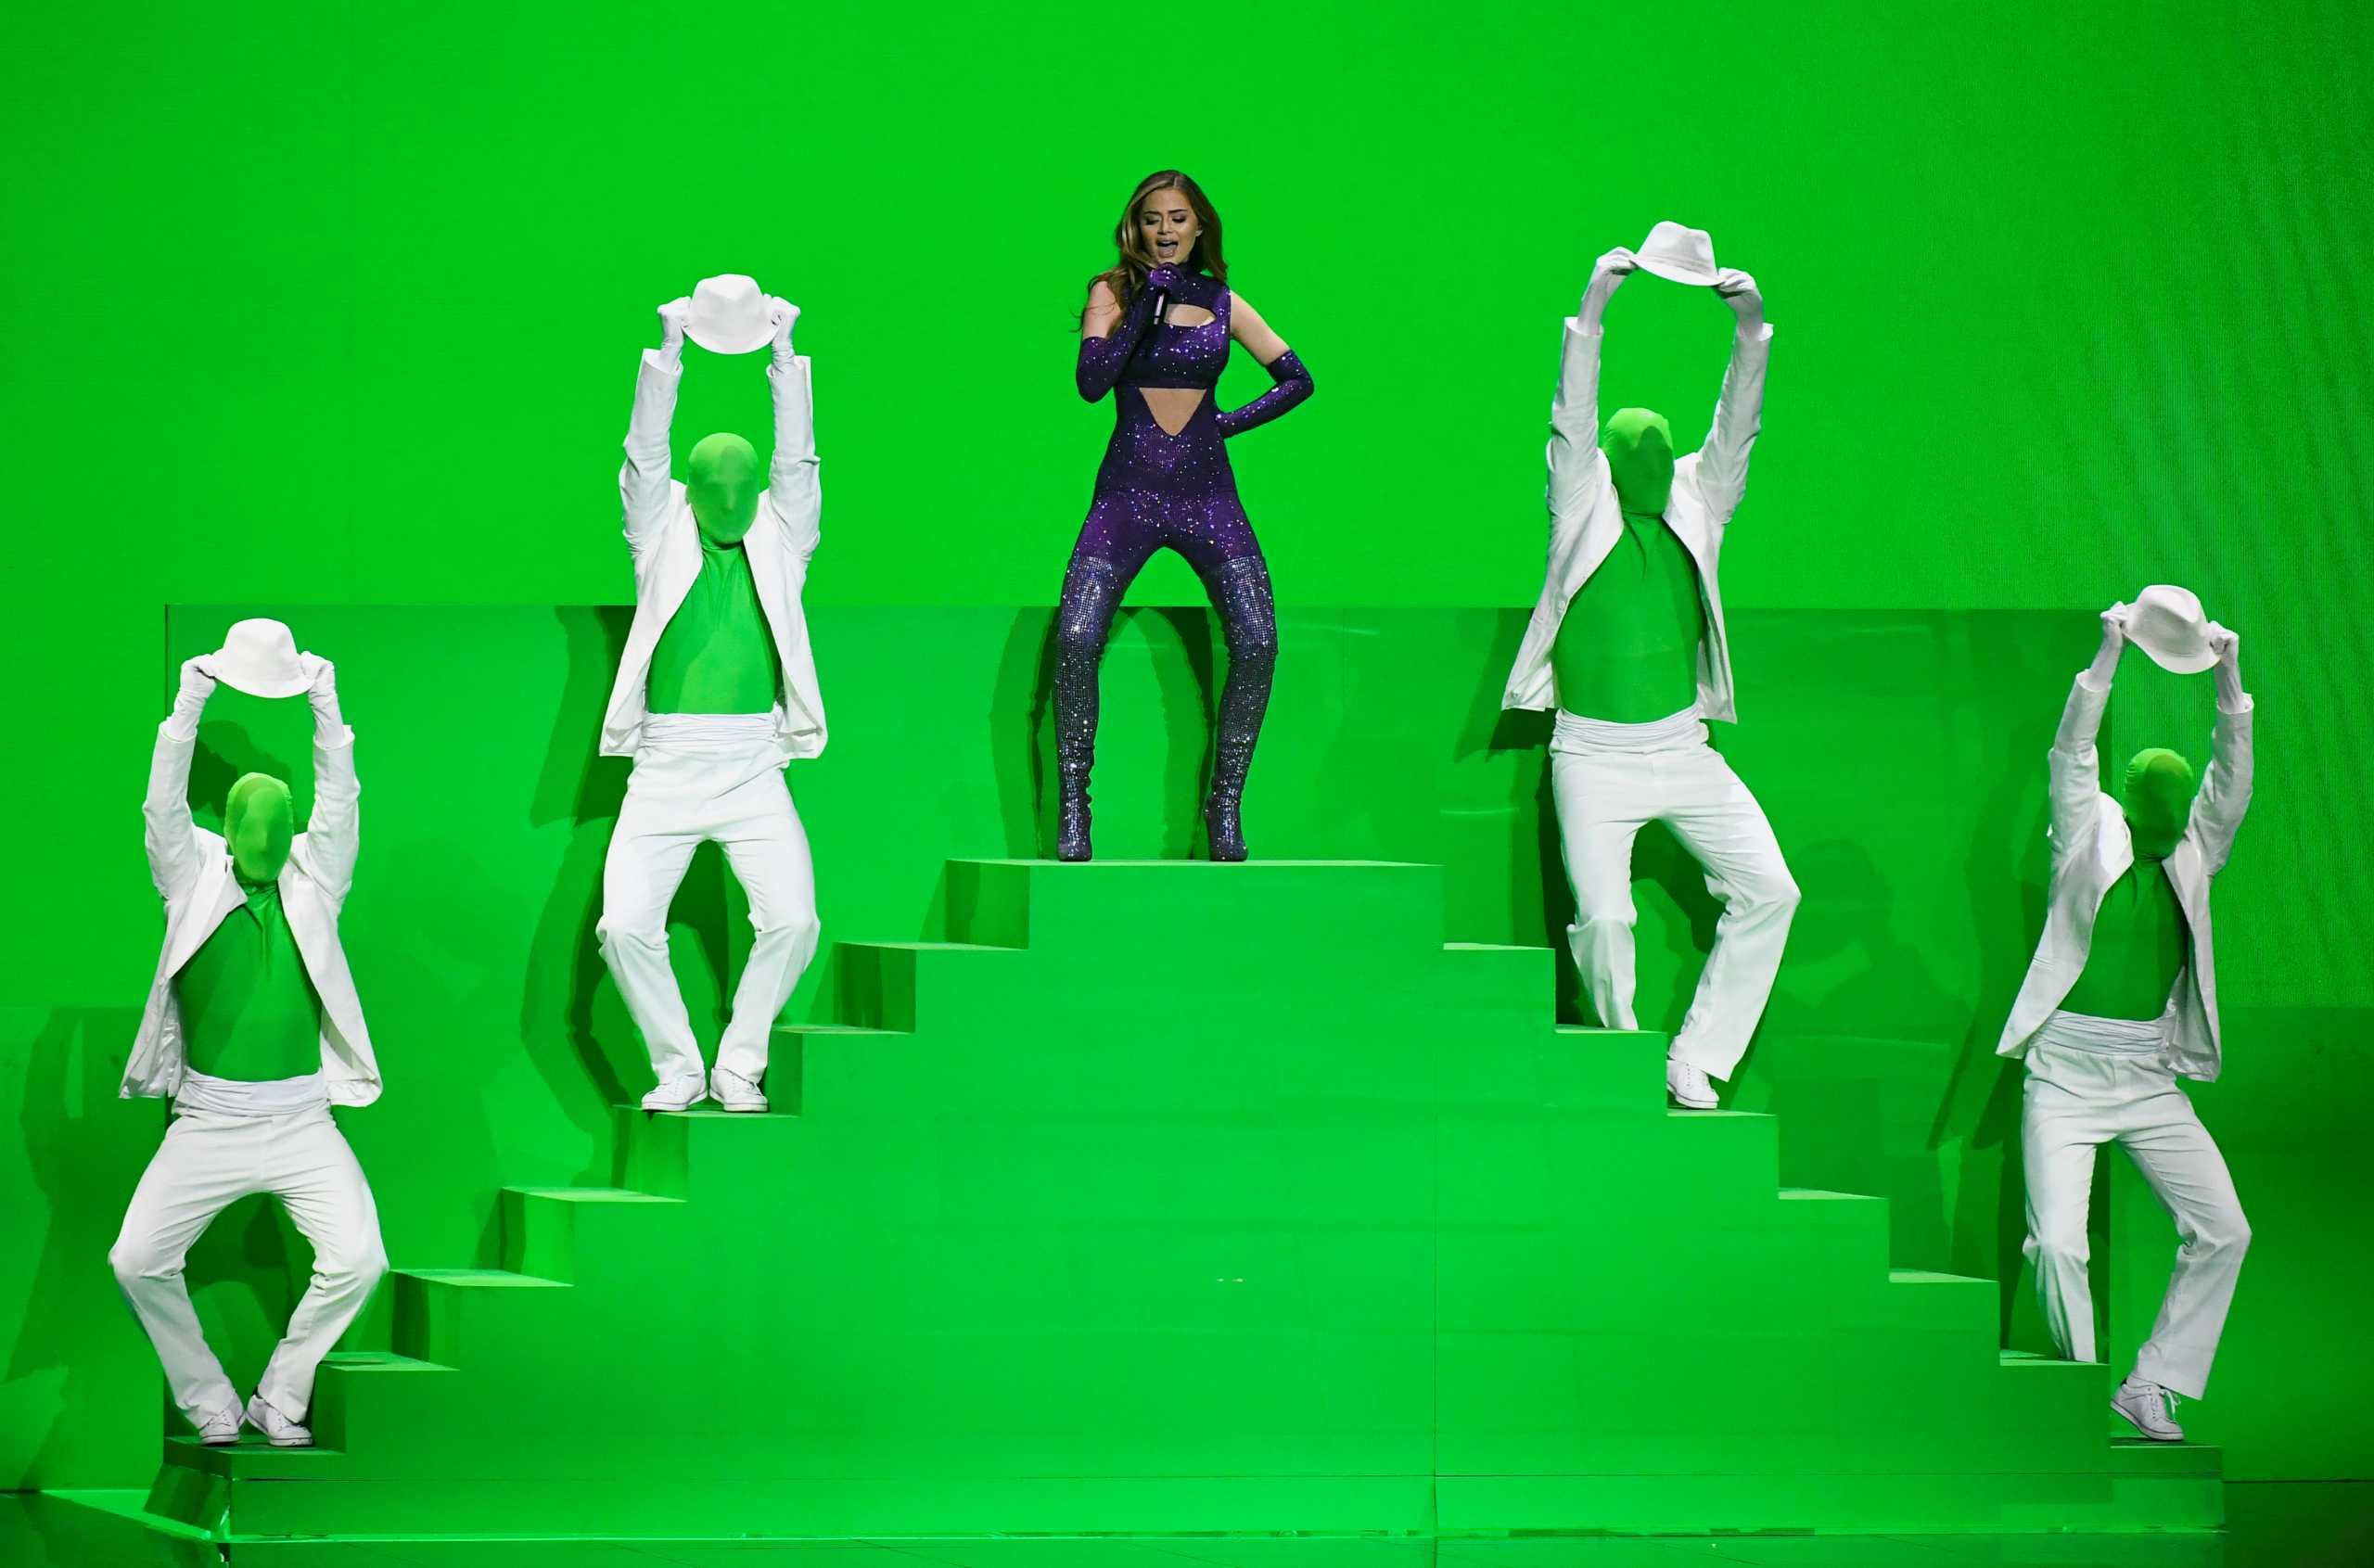 Eurovision 2021: Αυτή είναι η θέση που πήρε η Ελλάδα (video)